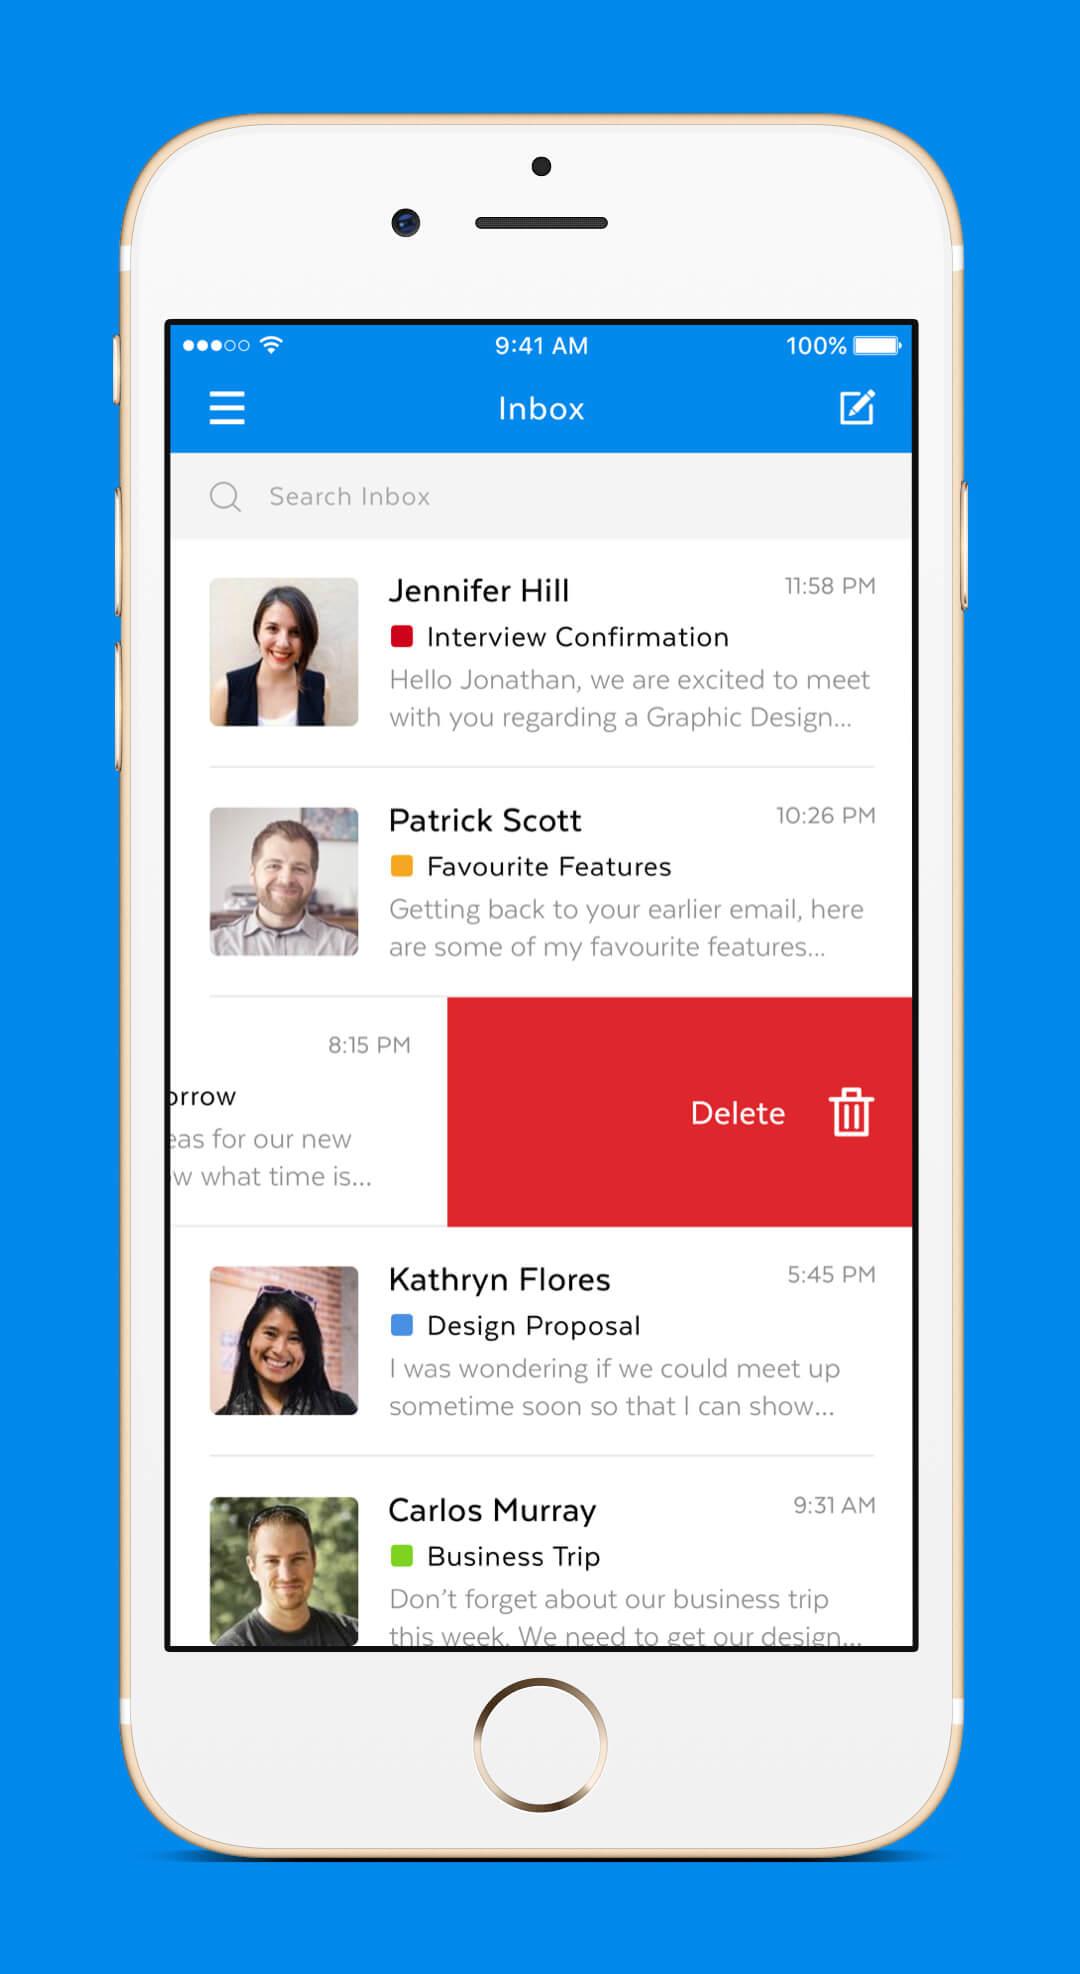 Mobile Mail App - Inbox Delete